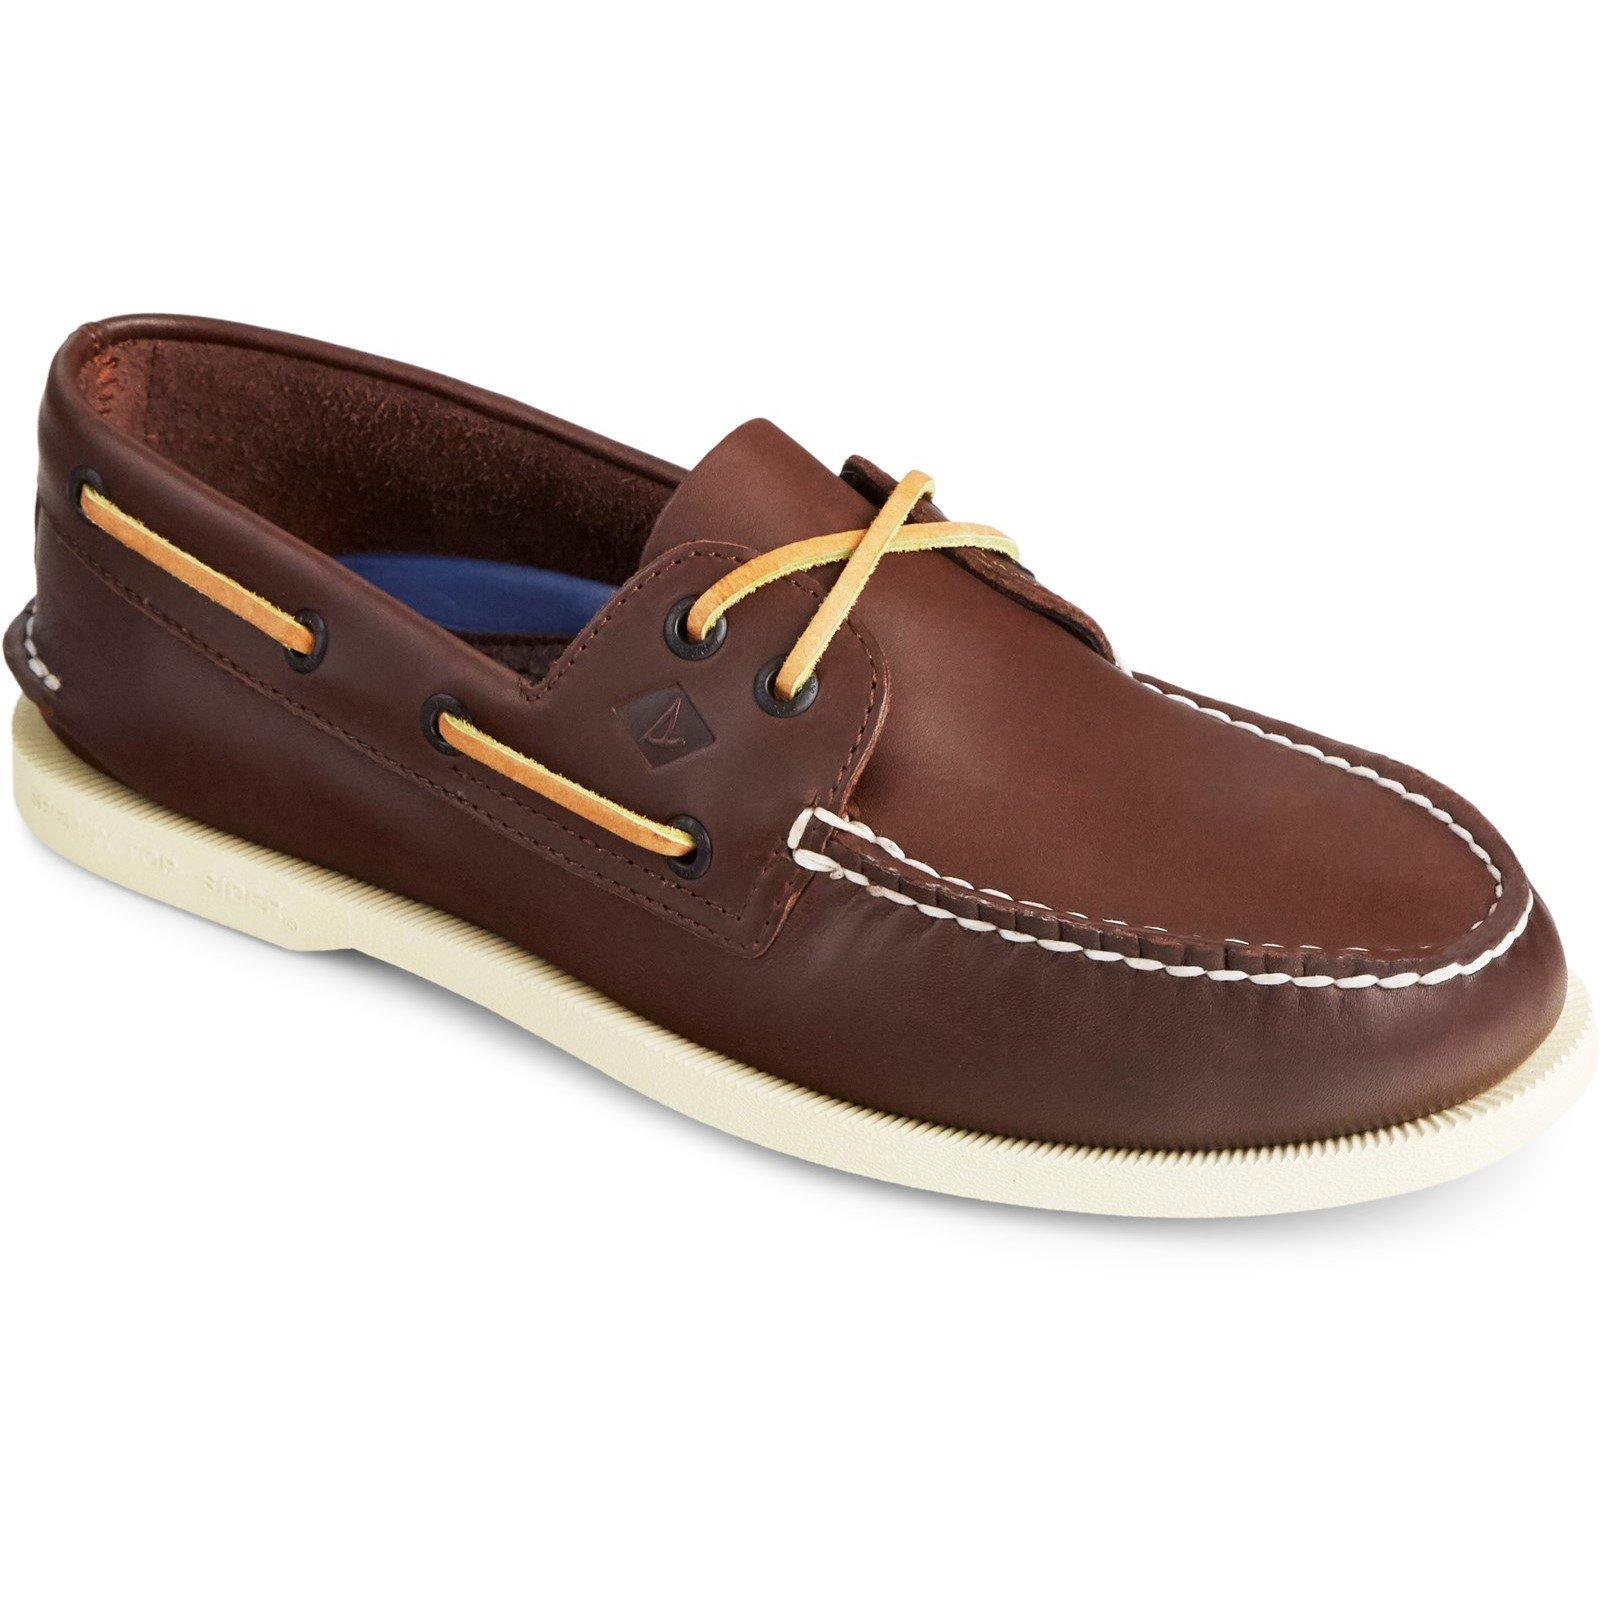 Sperry Men's Authentic Original Leather Boat Shoe Various Colours 31524 - Brown 12